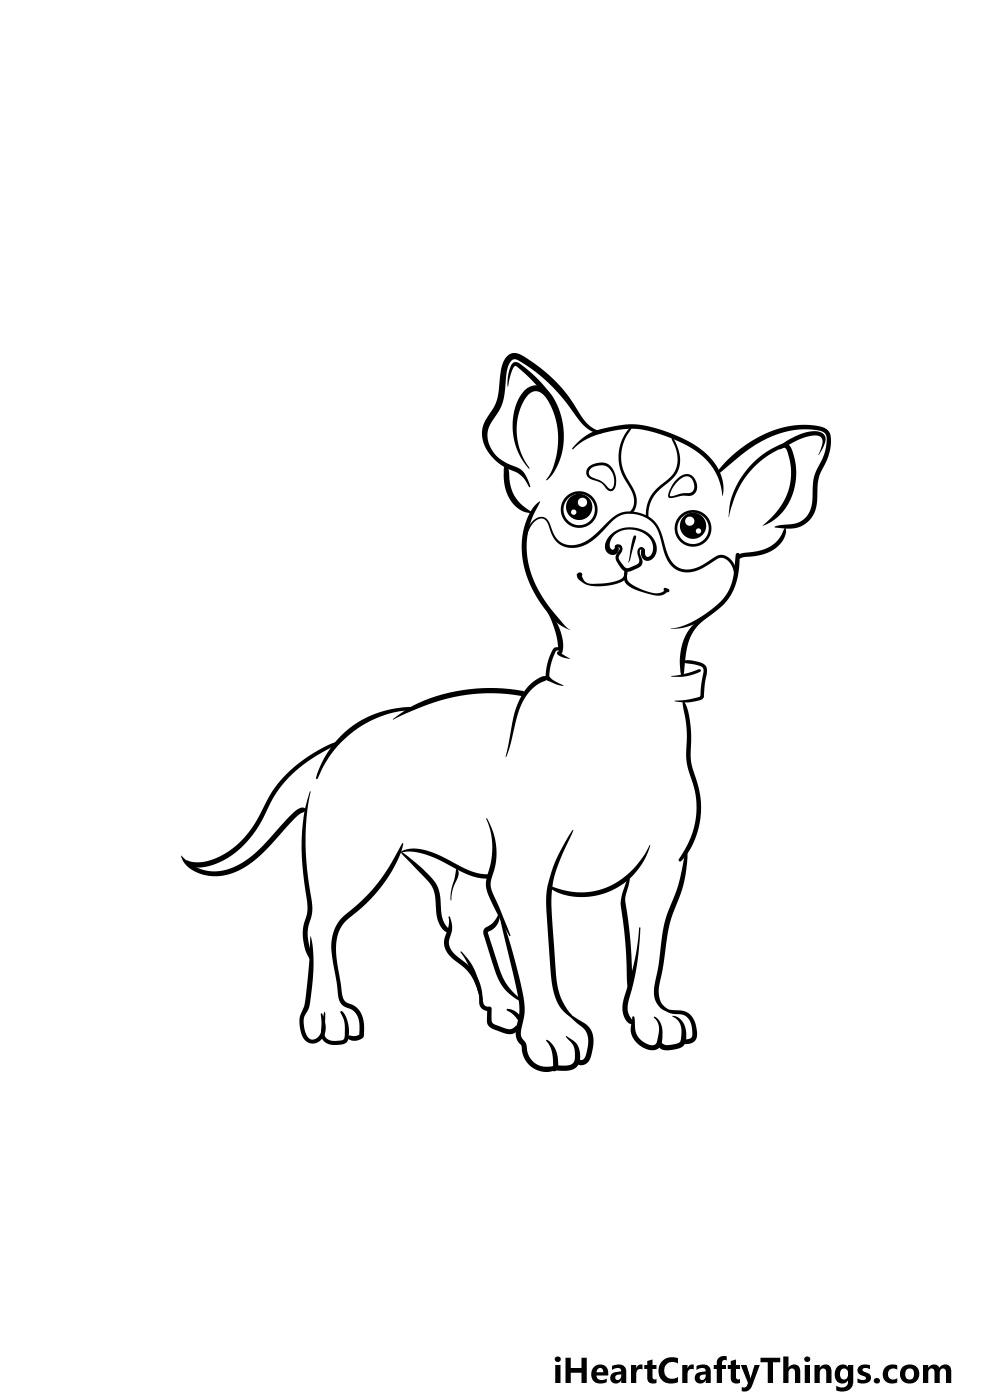 drawing a chihuahua step 6